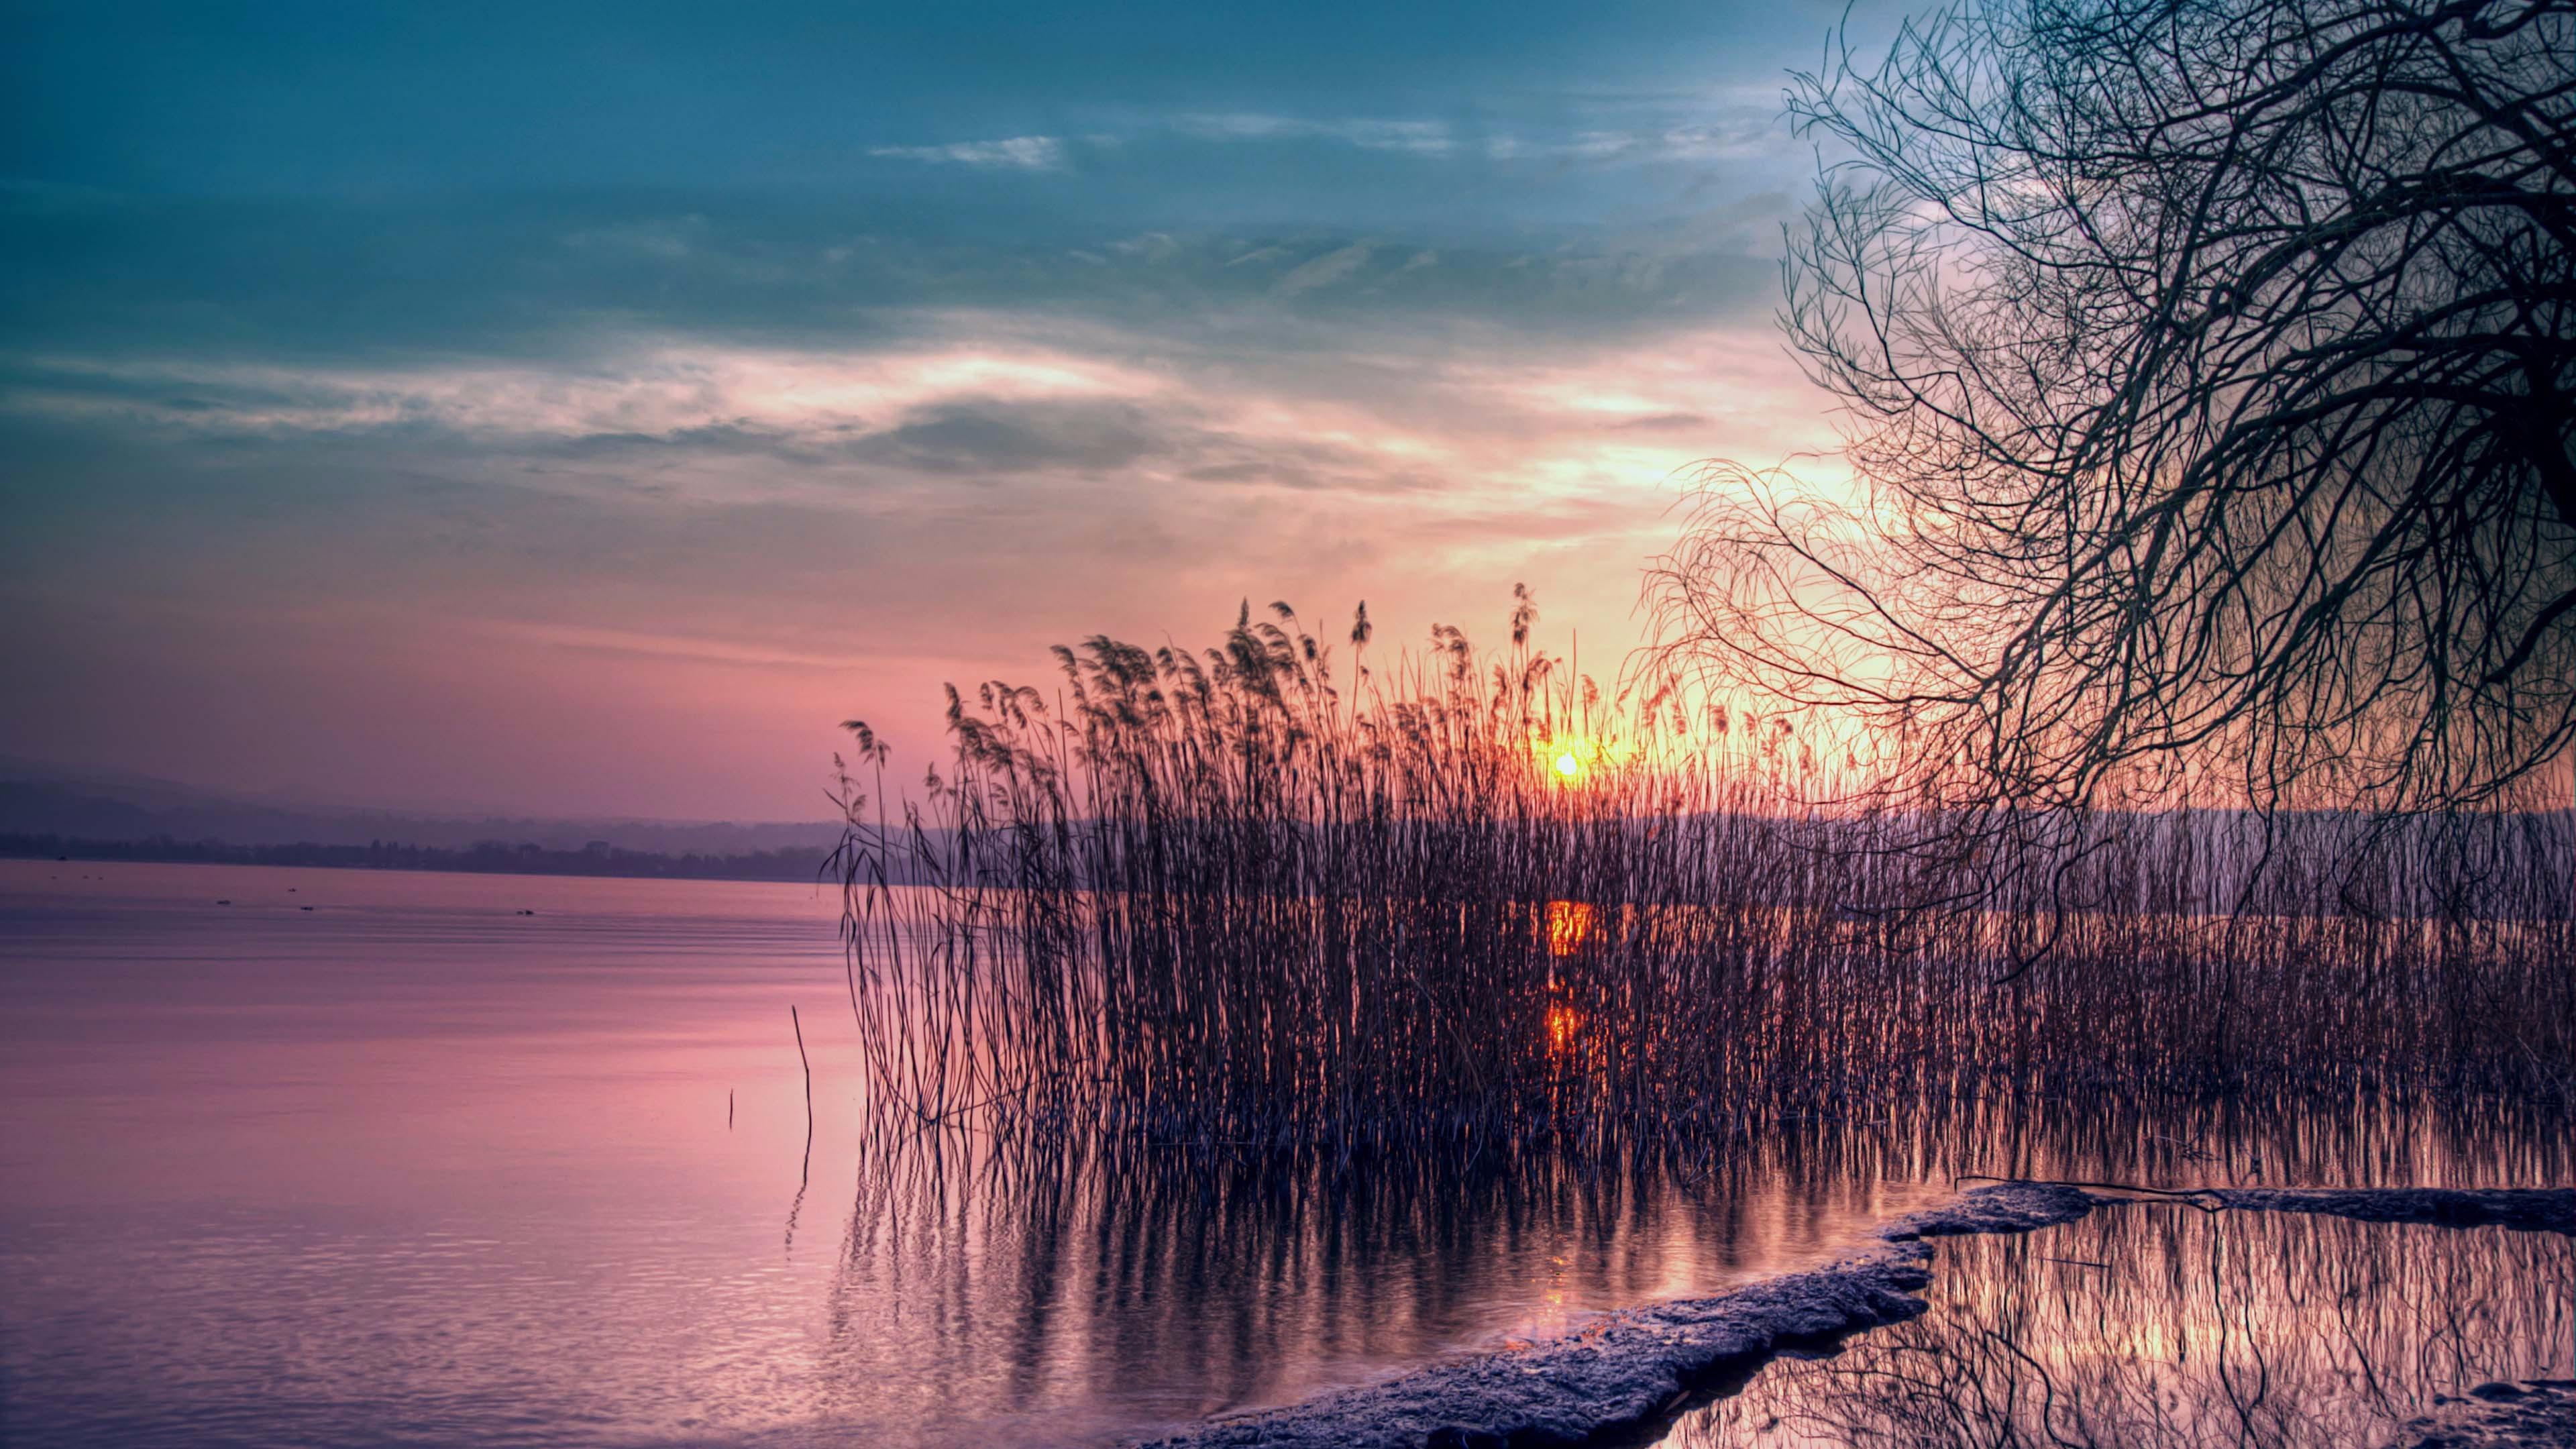 Sunset among the reeds wallpaper